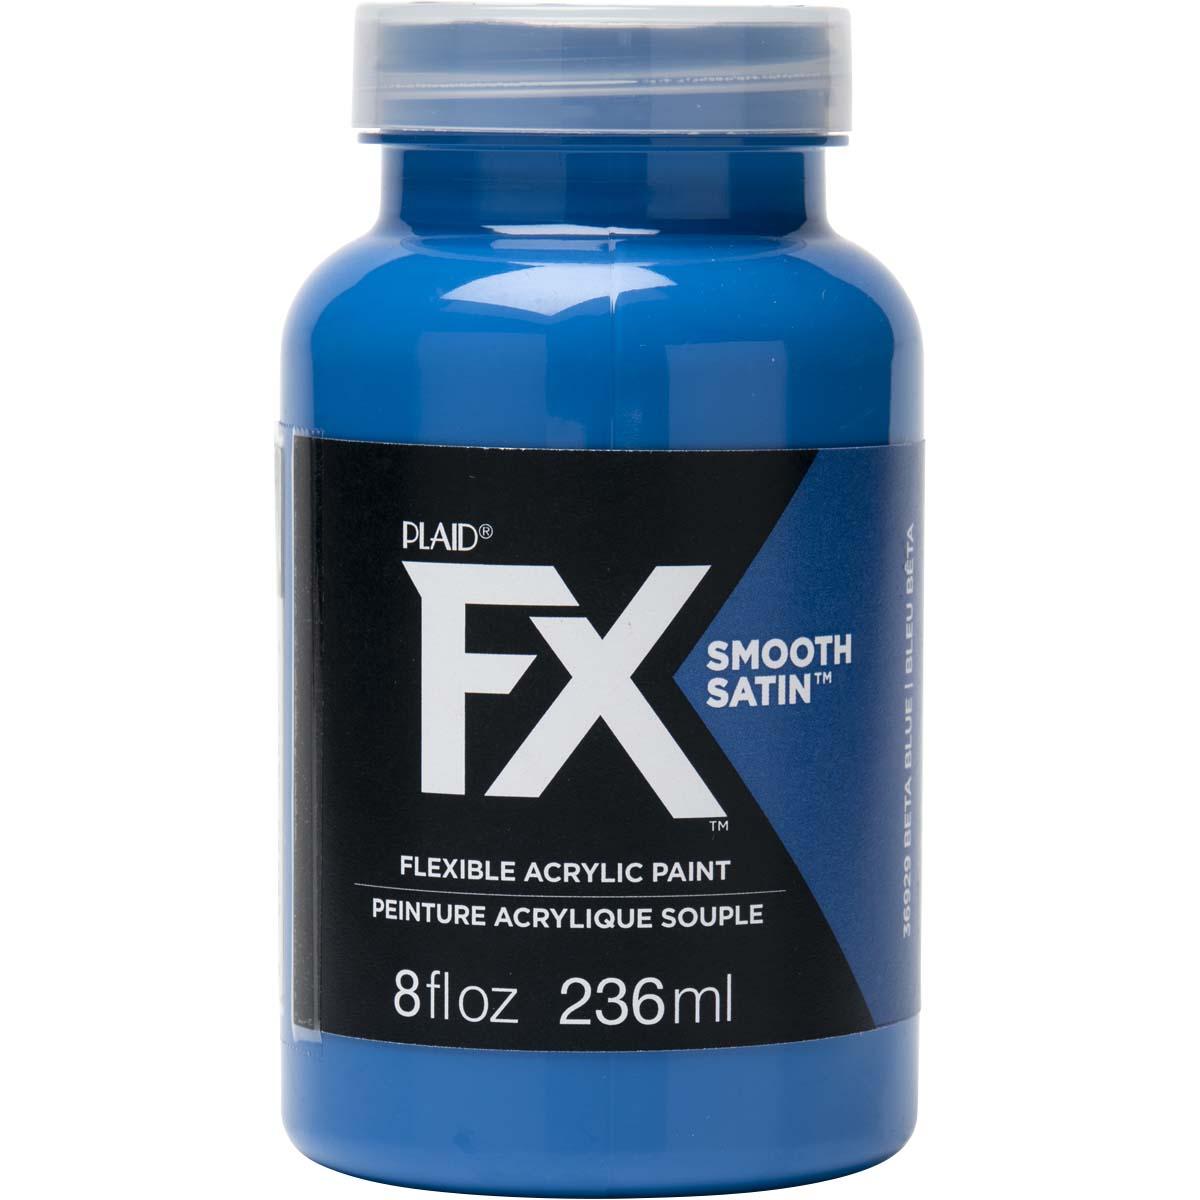 PlaidFX Smooth Satin Flexible Acrylic Paint - Beta Blue, 8 oz. - 36929